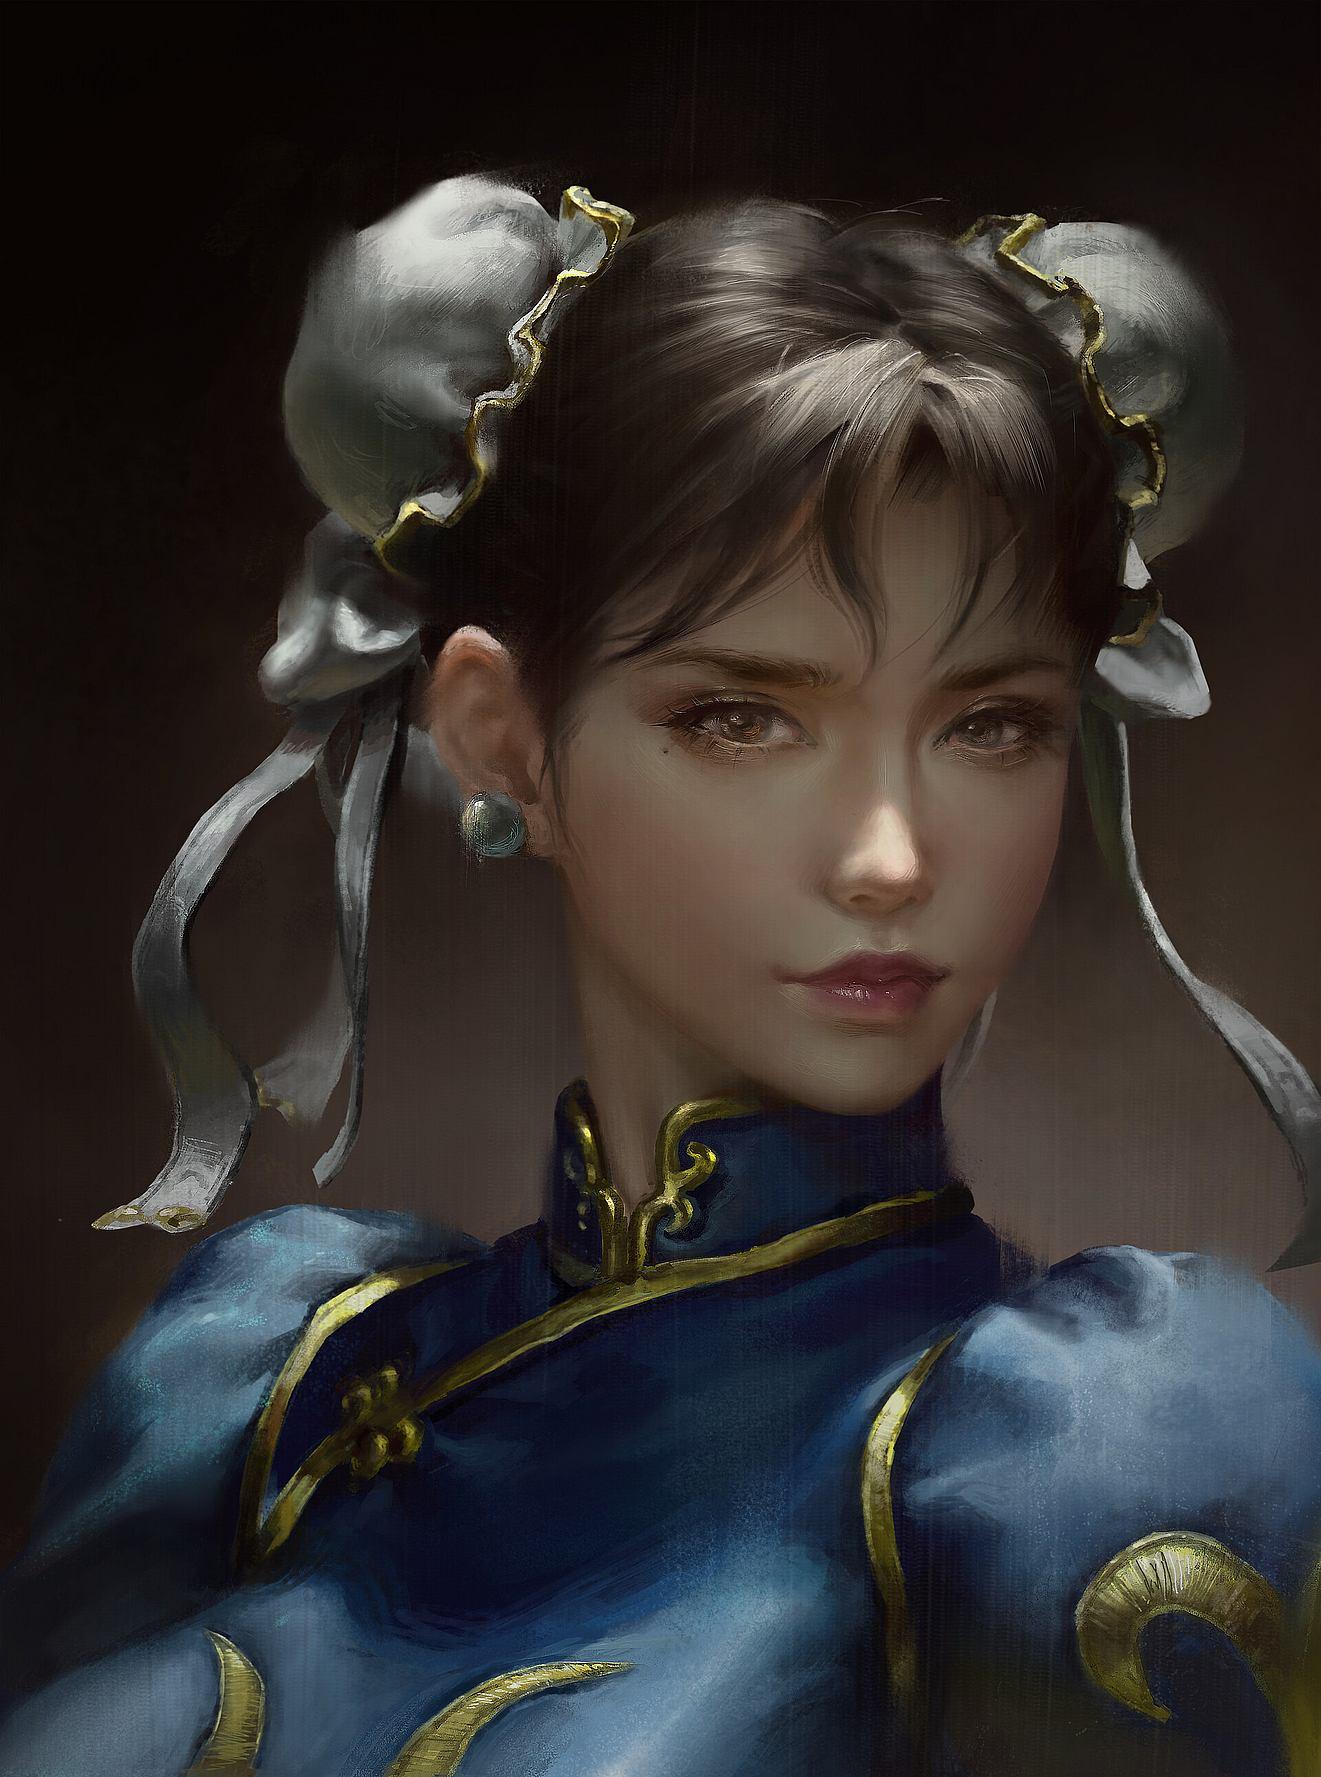 Chun Li Street Fighter Digital Drawing Artist Ley Bowen 张